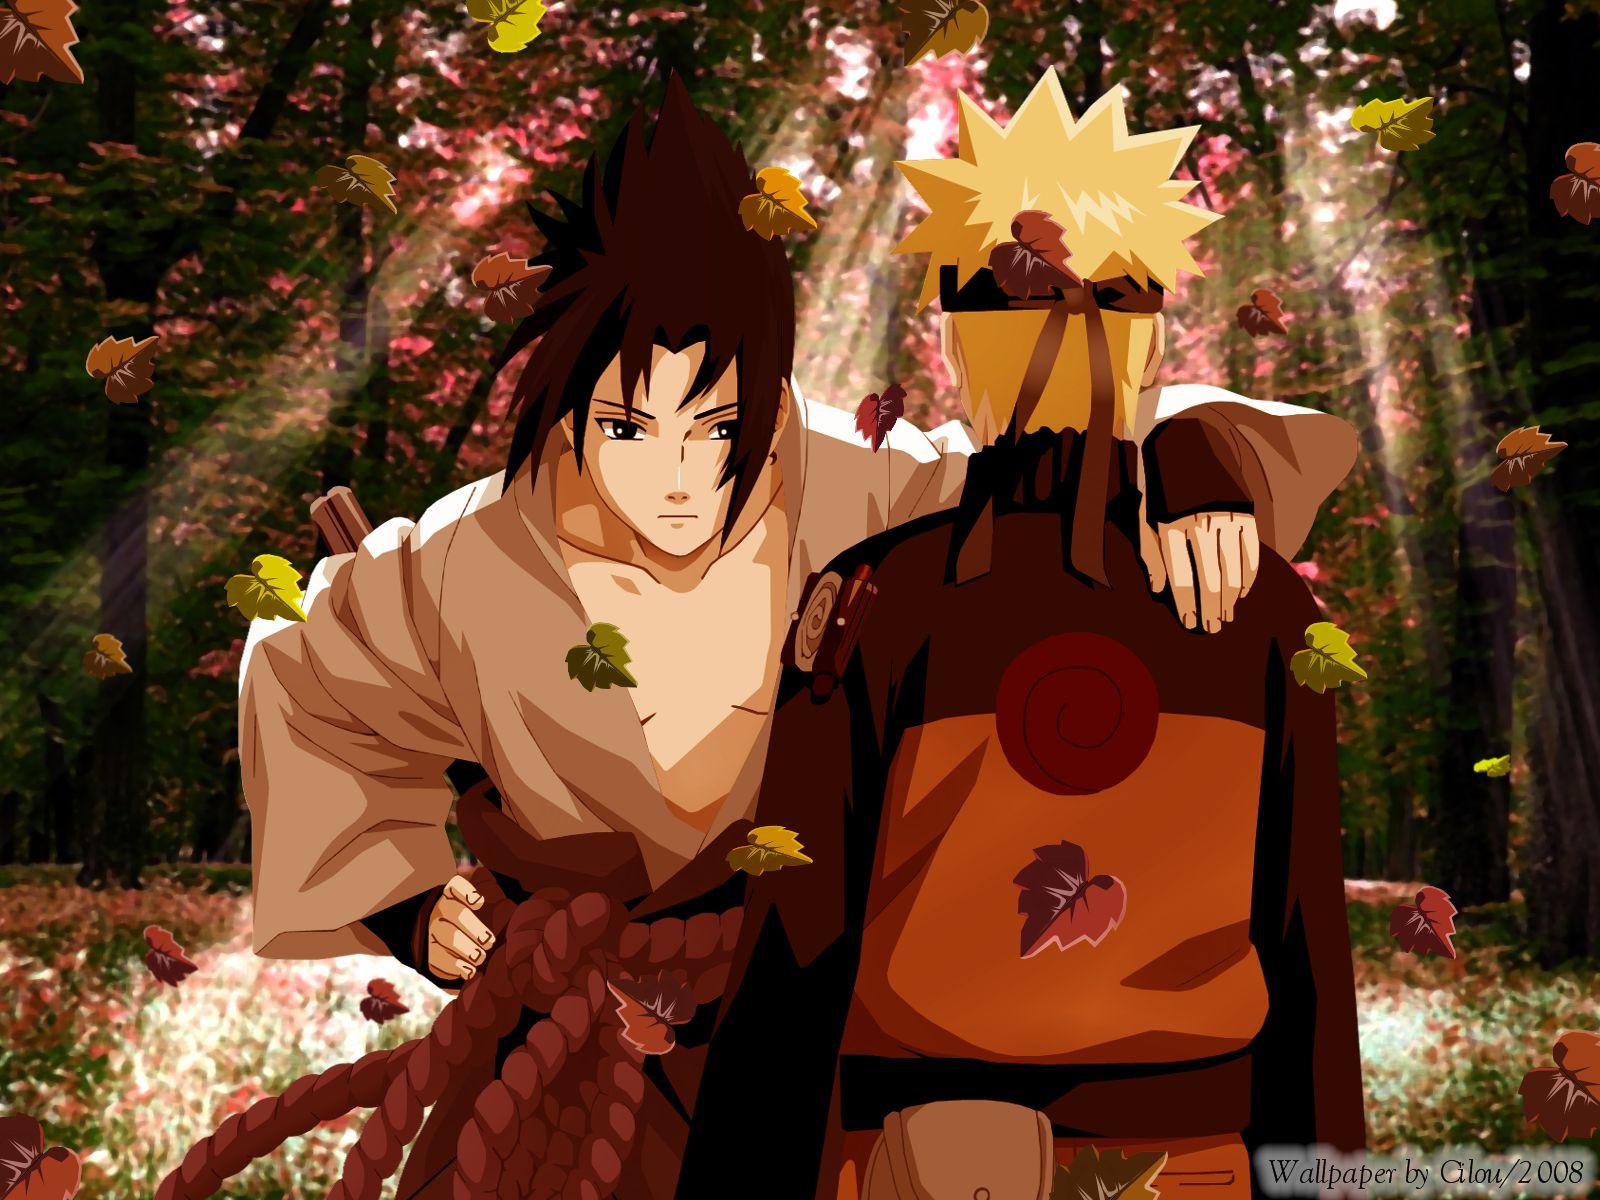 Beautiful Wallpaper Halloween Naruto - Wallpapers-sasuke-naruto-shippuden-hd-anime-images-naruto-wallpapers  2018_553751.jpg